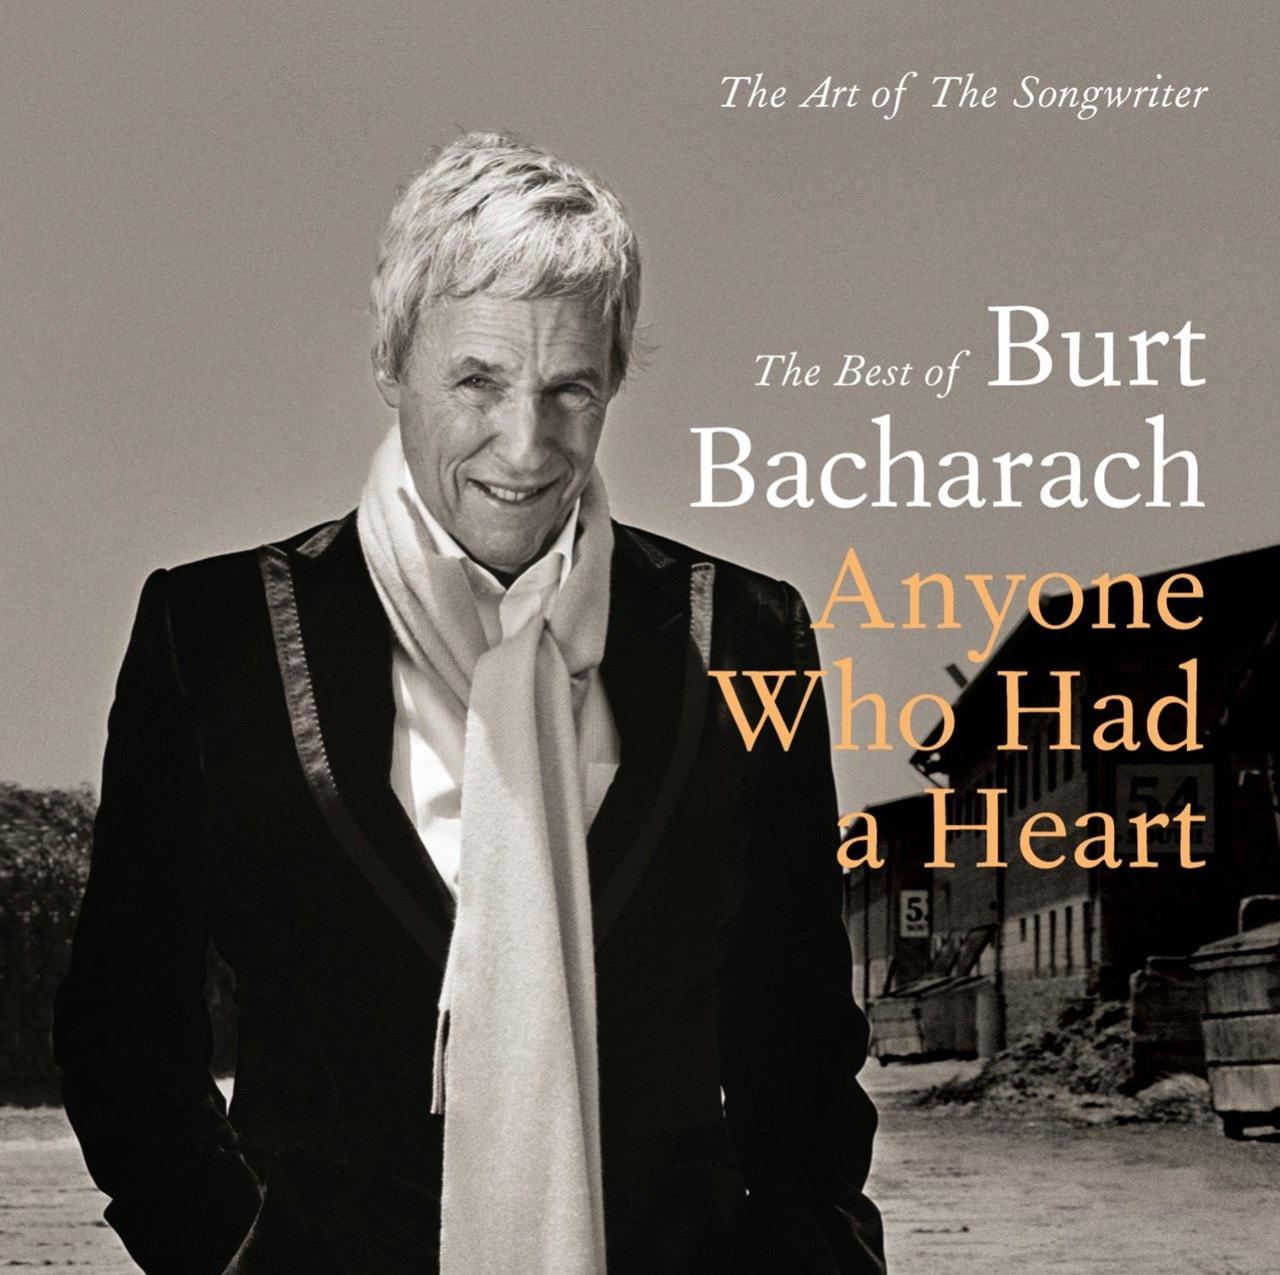 Anyone Who Had a Heart: The Best of Burt Bacharach - 1